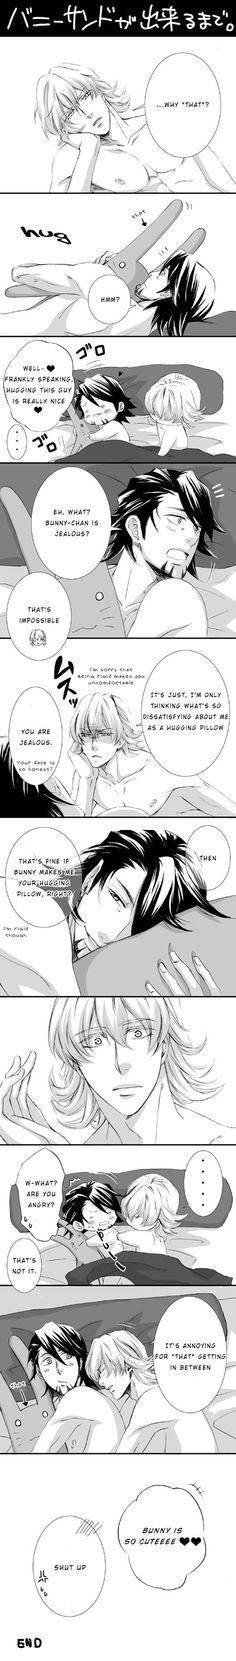 Tiger  Bunny ~~ The hugging pillow war :: Kotetsu x Barnaby